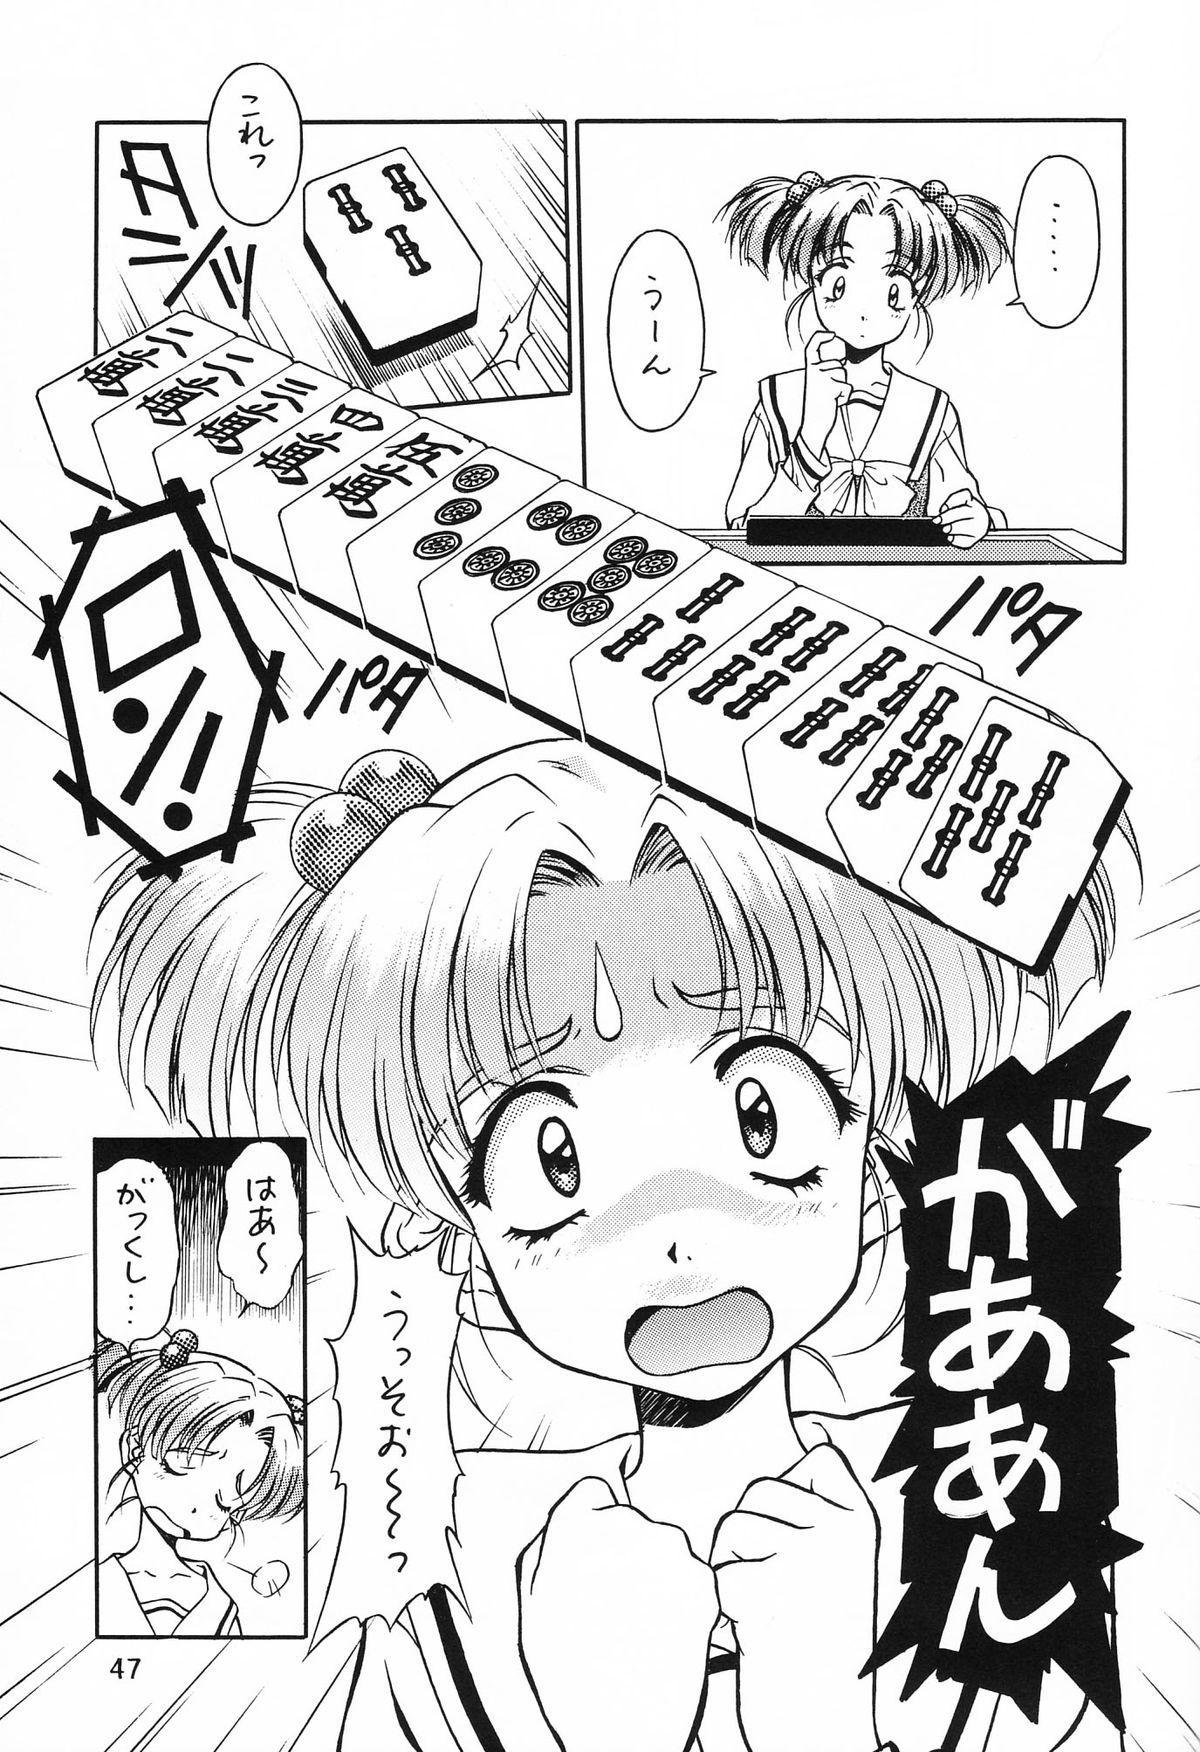 Henrei-kai '98 Natsu SPECIAL 48